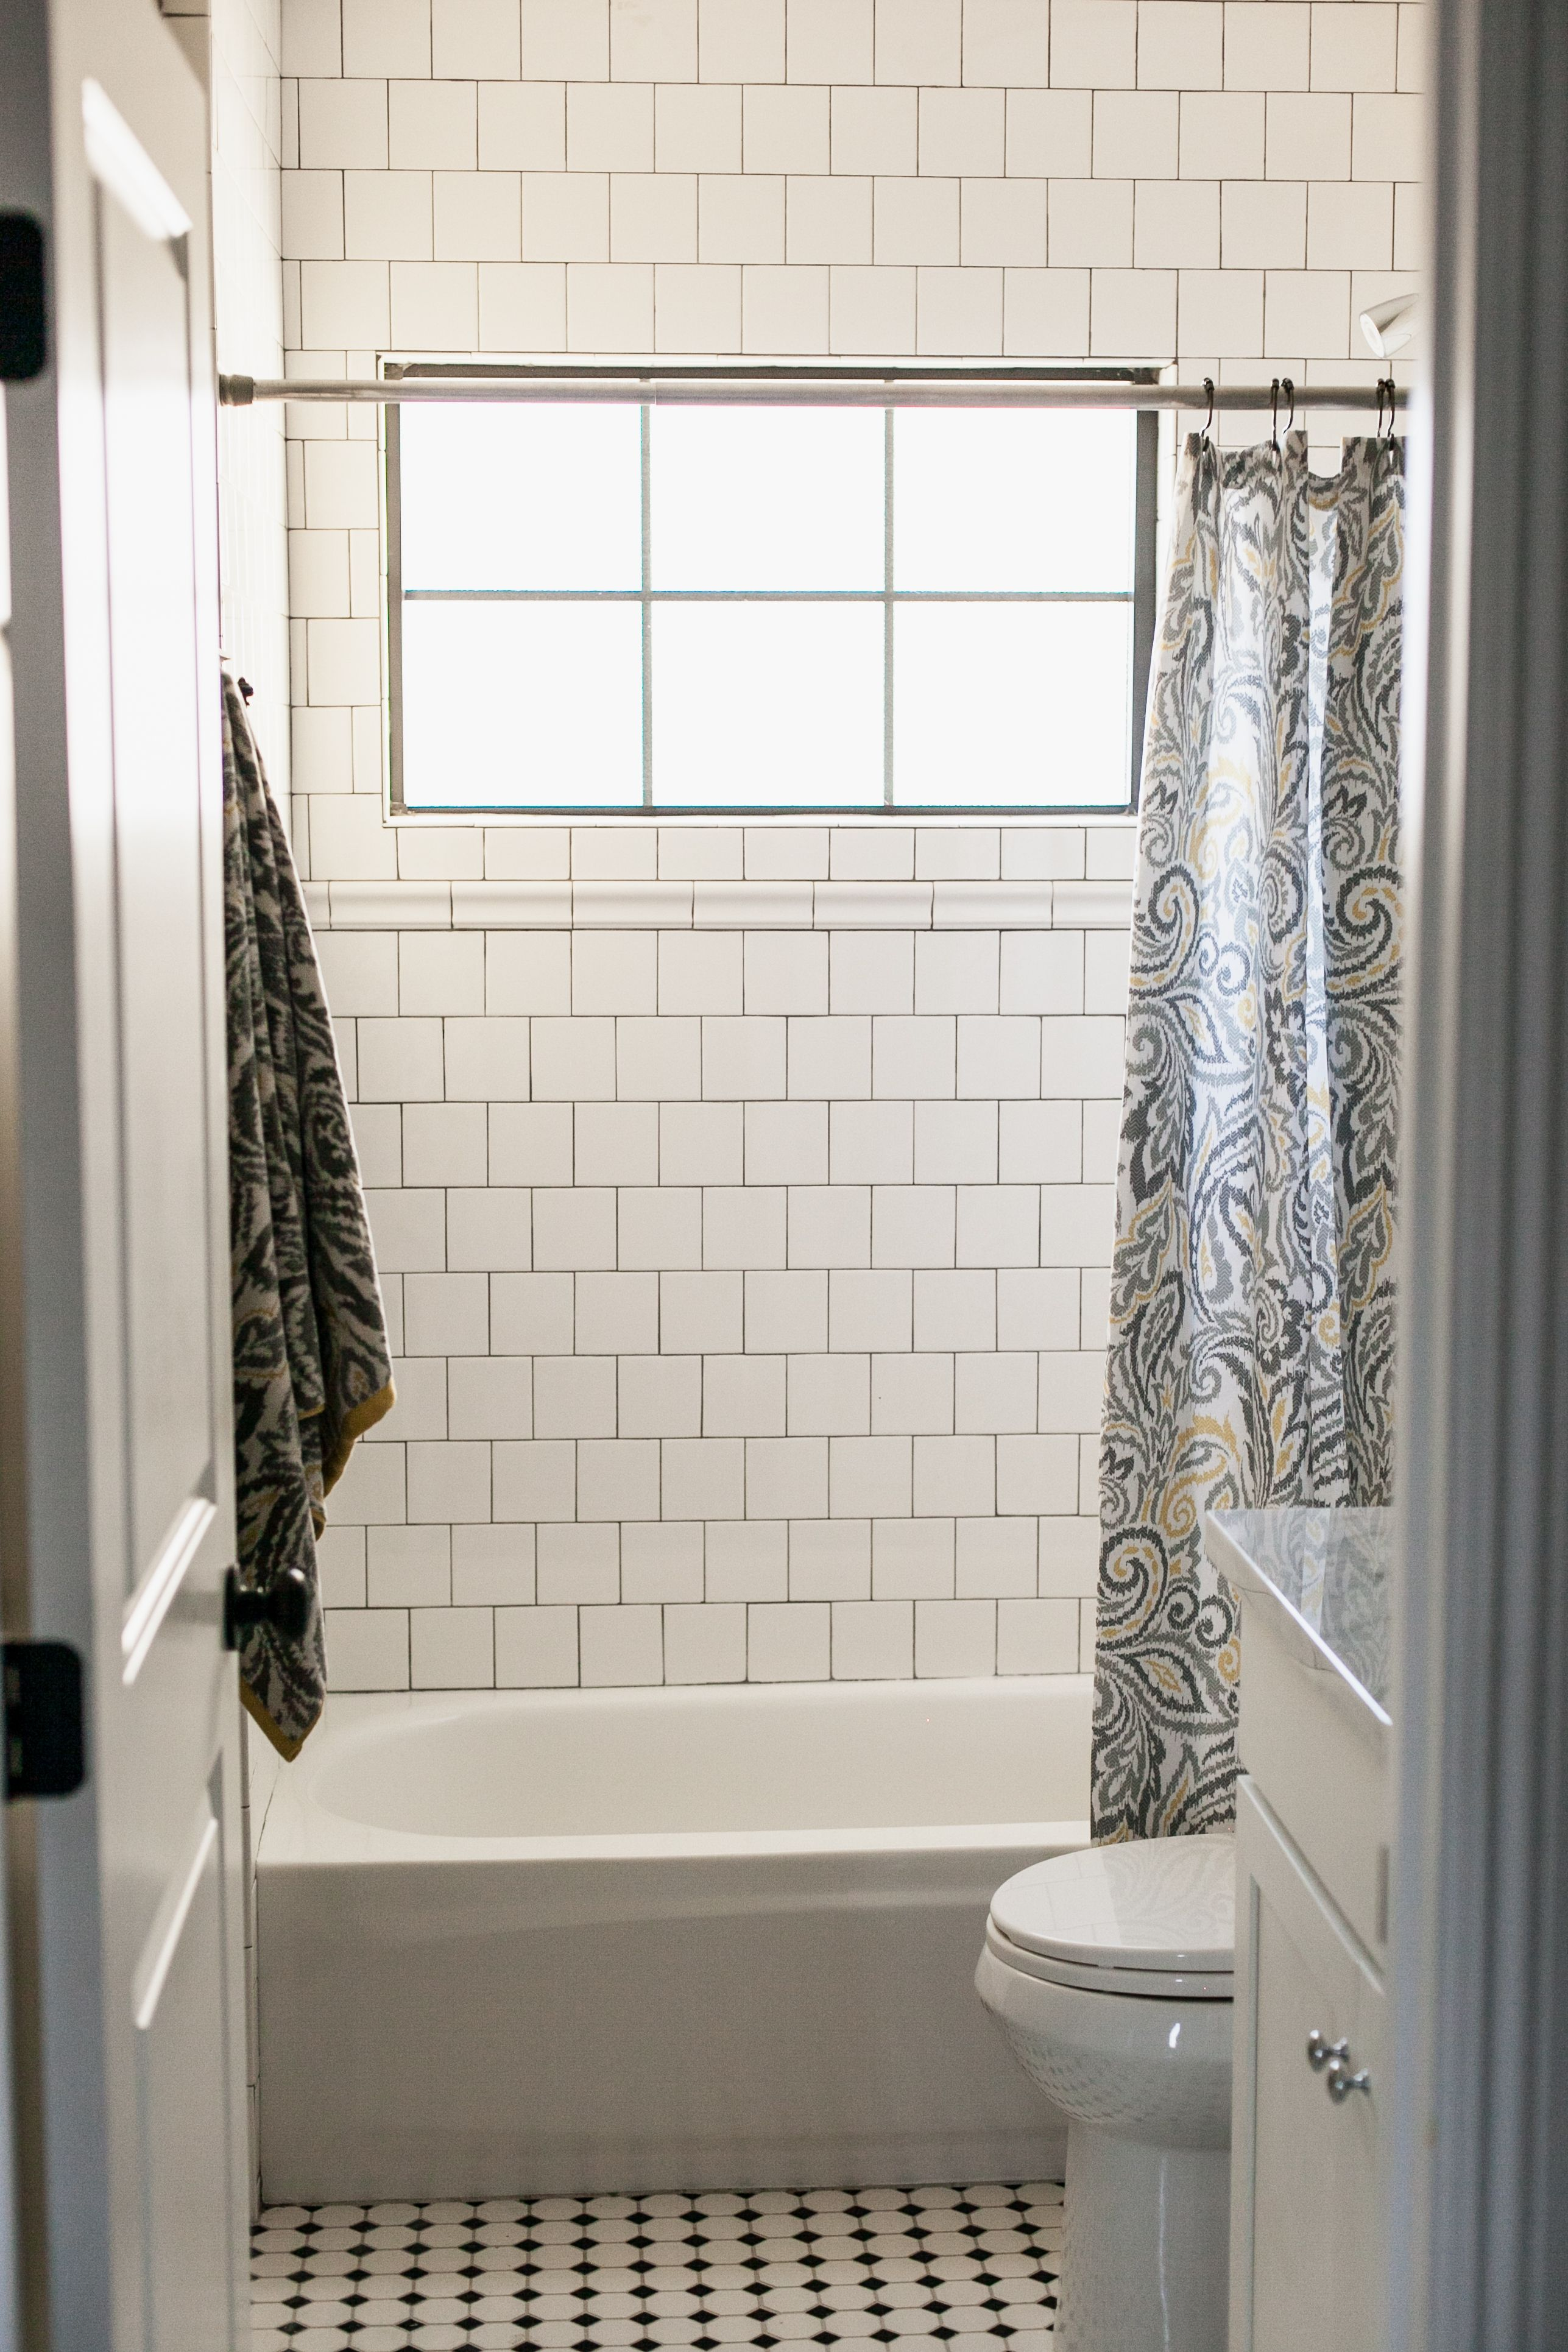 4x4 Bathroom Tile 4x4 Bathroom Tile Designs 4x4 Ceramic Bathroom